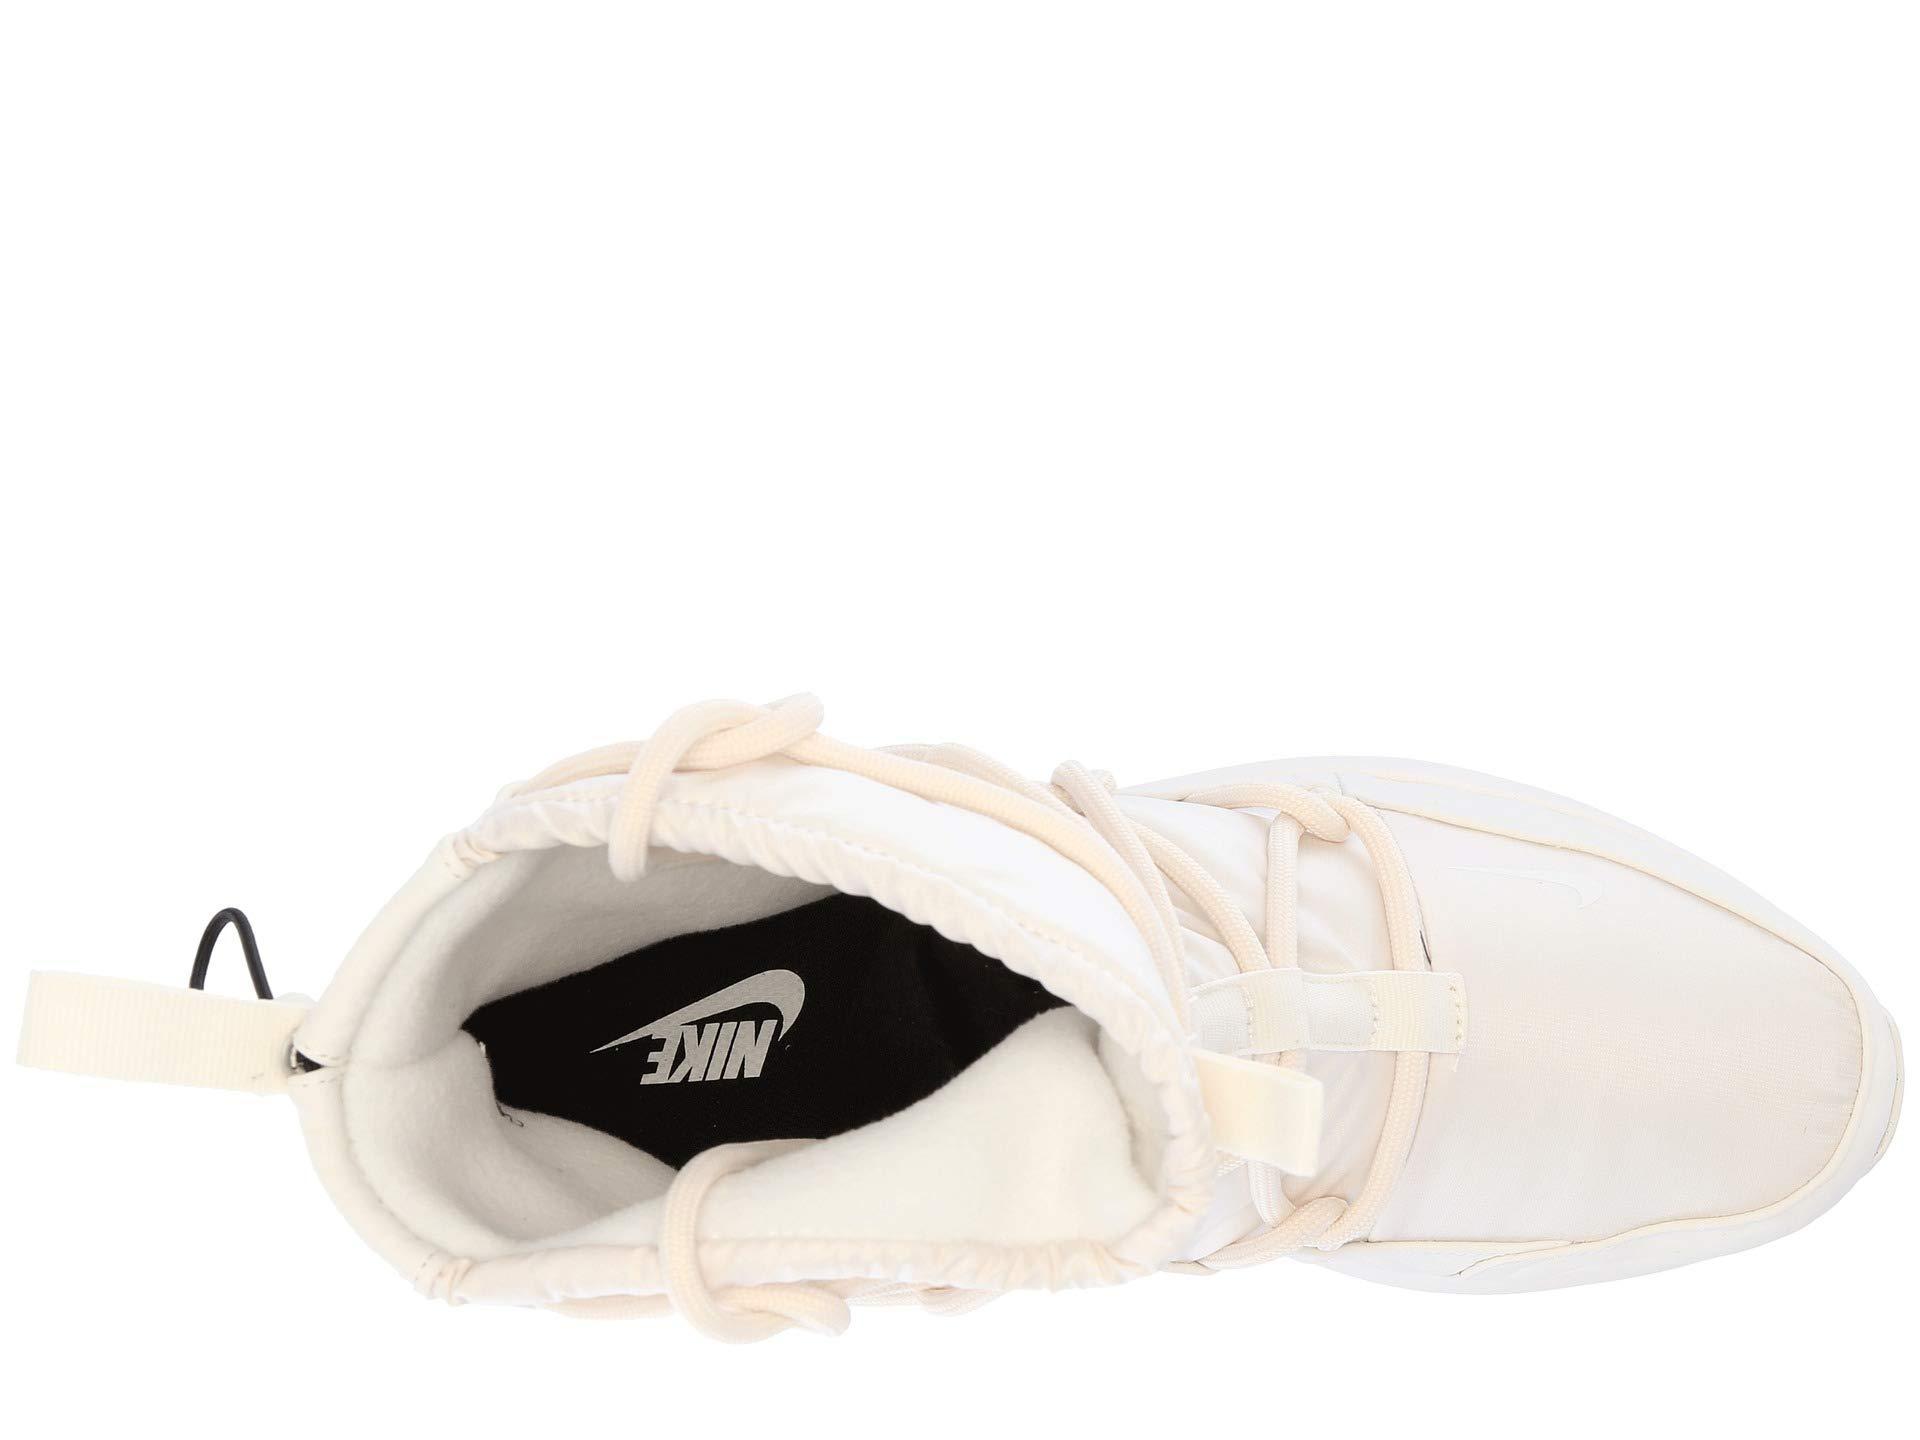 wholesale dealer 56159 5cc9f Nike - Multicolor Tanjun High-rise - Lyst. View fullscreen